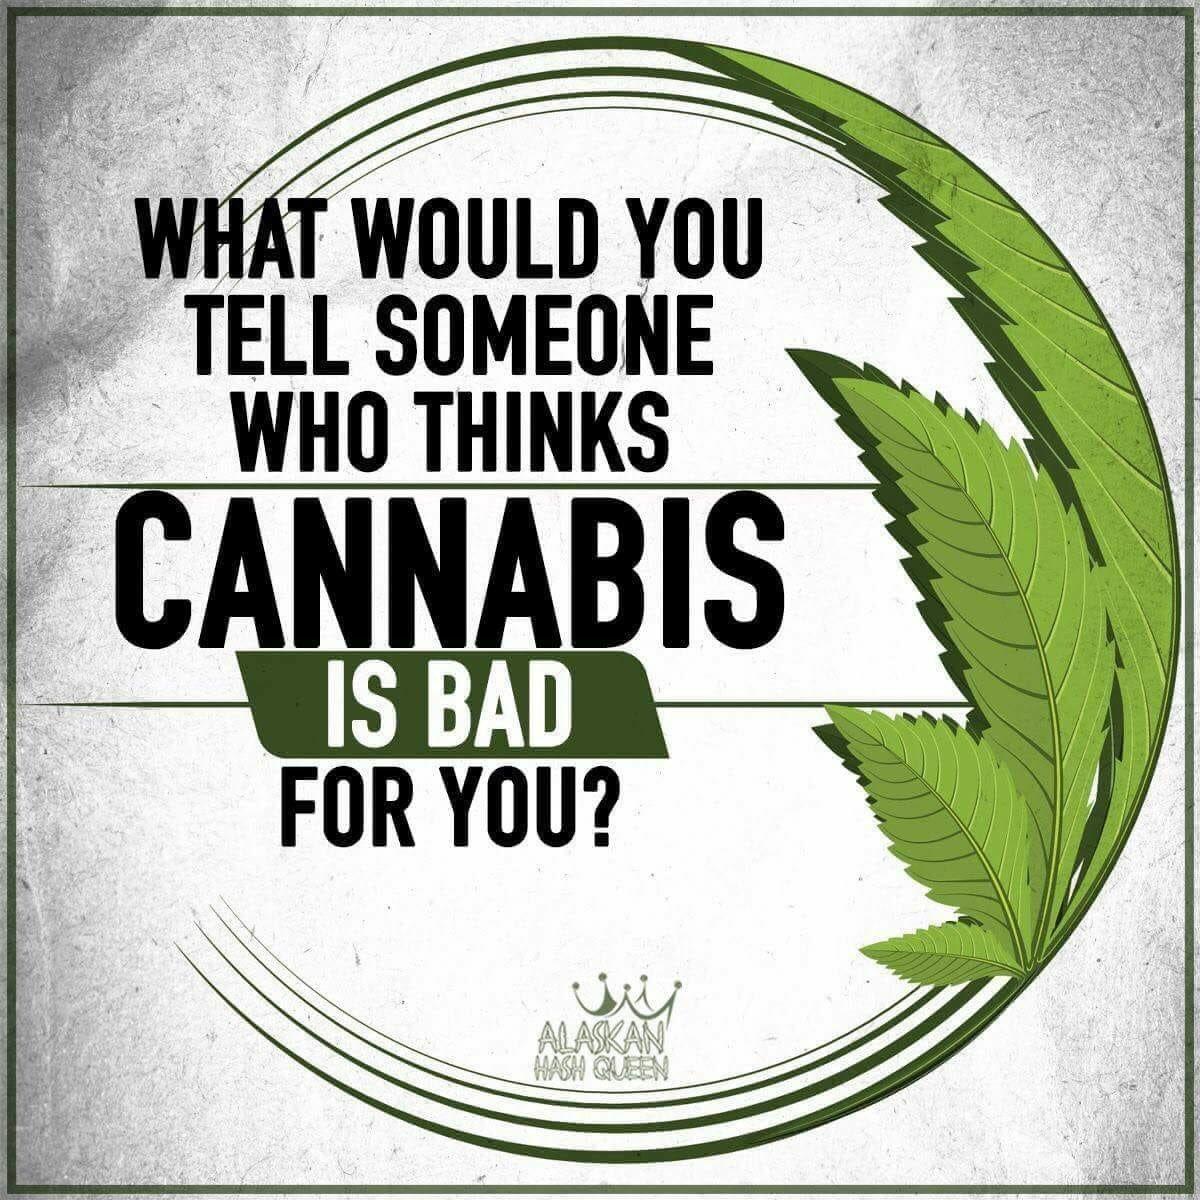 i might tell them to google these 3: #endocannabinoids #RaphaelMechoulam #phytocannabinoids